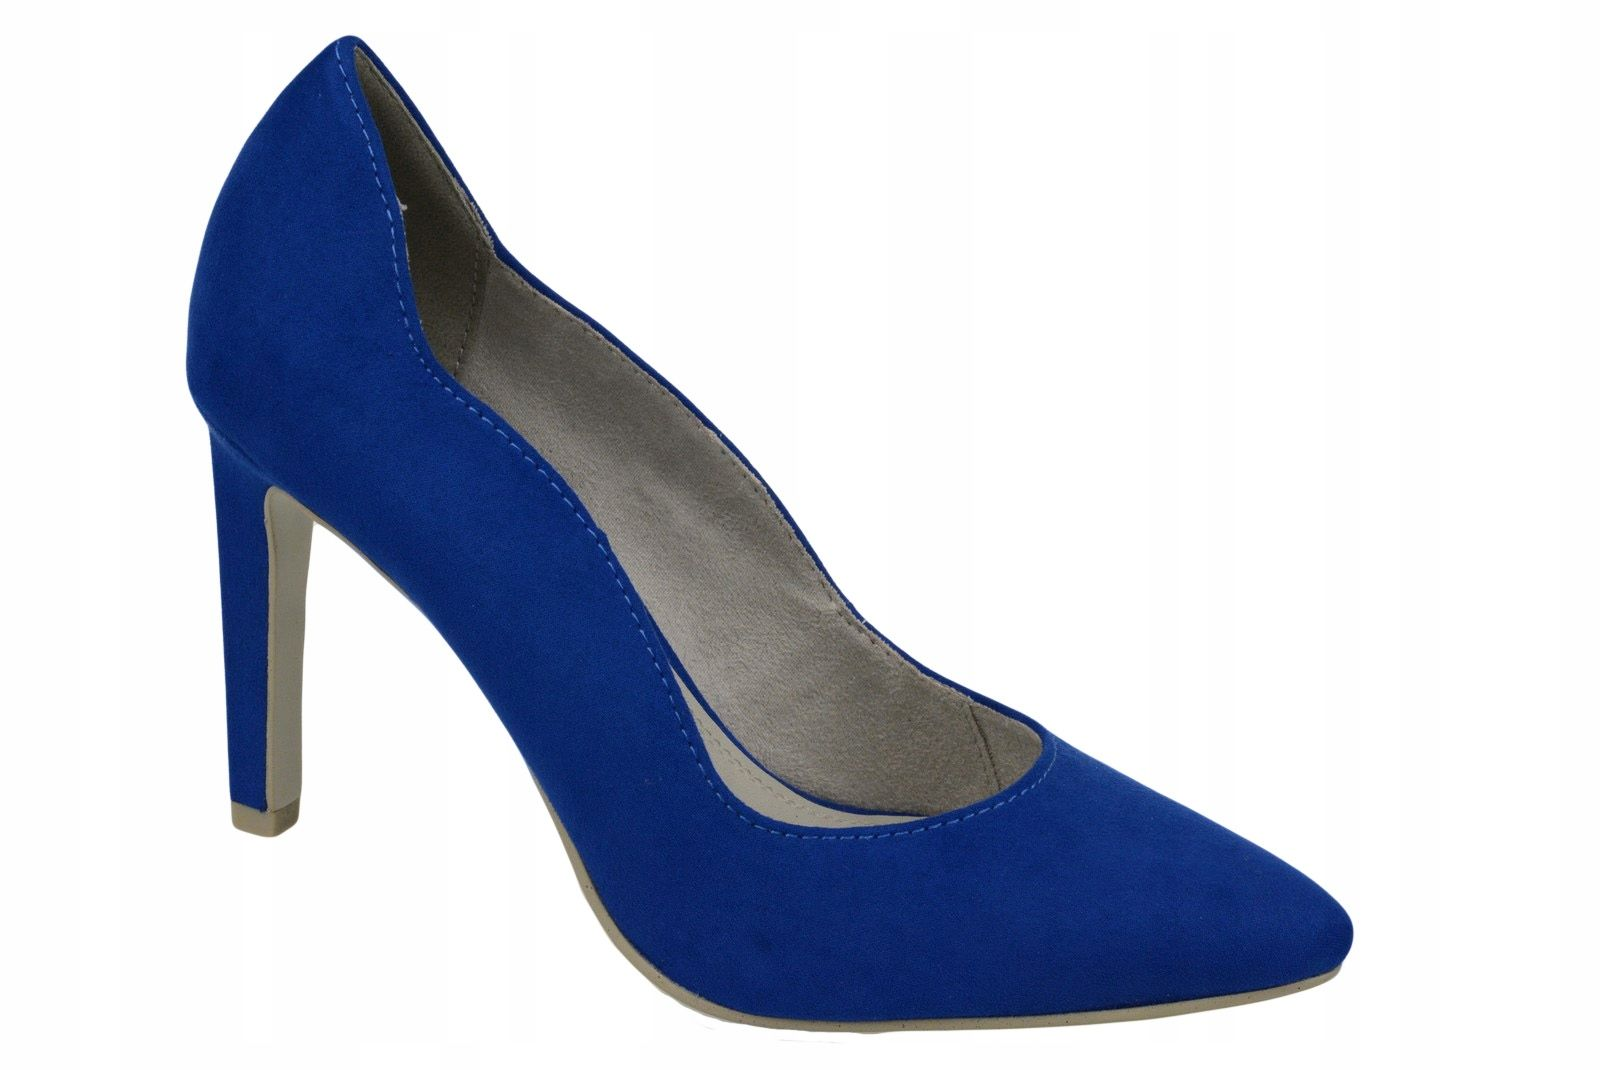 Marco Tozzi Szpilki Czolenka Royal 22422 22 38 7840481494 Oficjalne Archiwum Allegro Heels Shoes Pumps